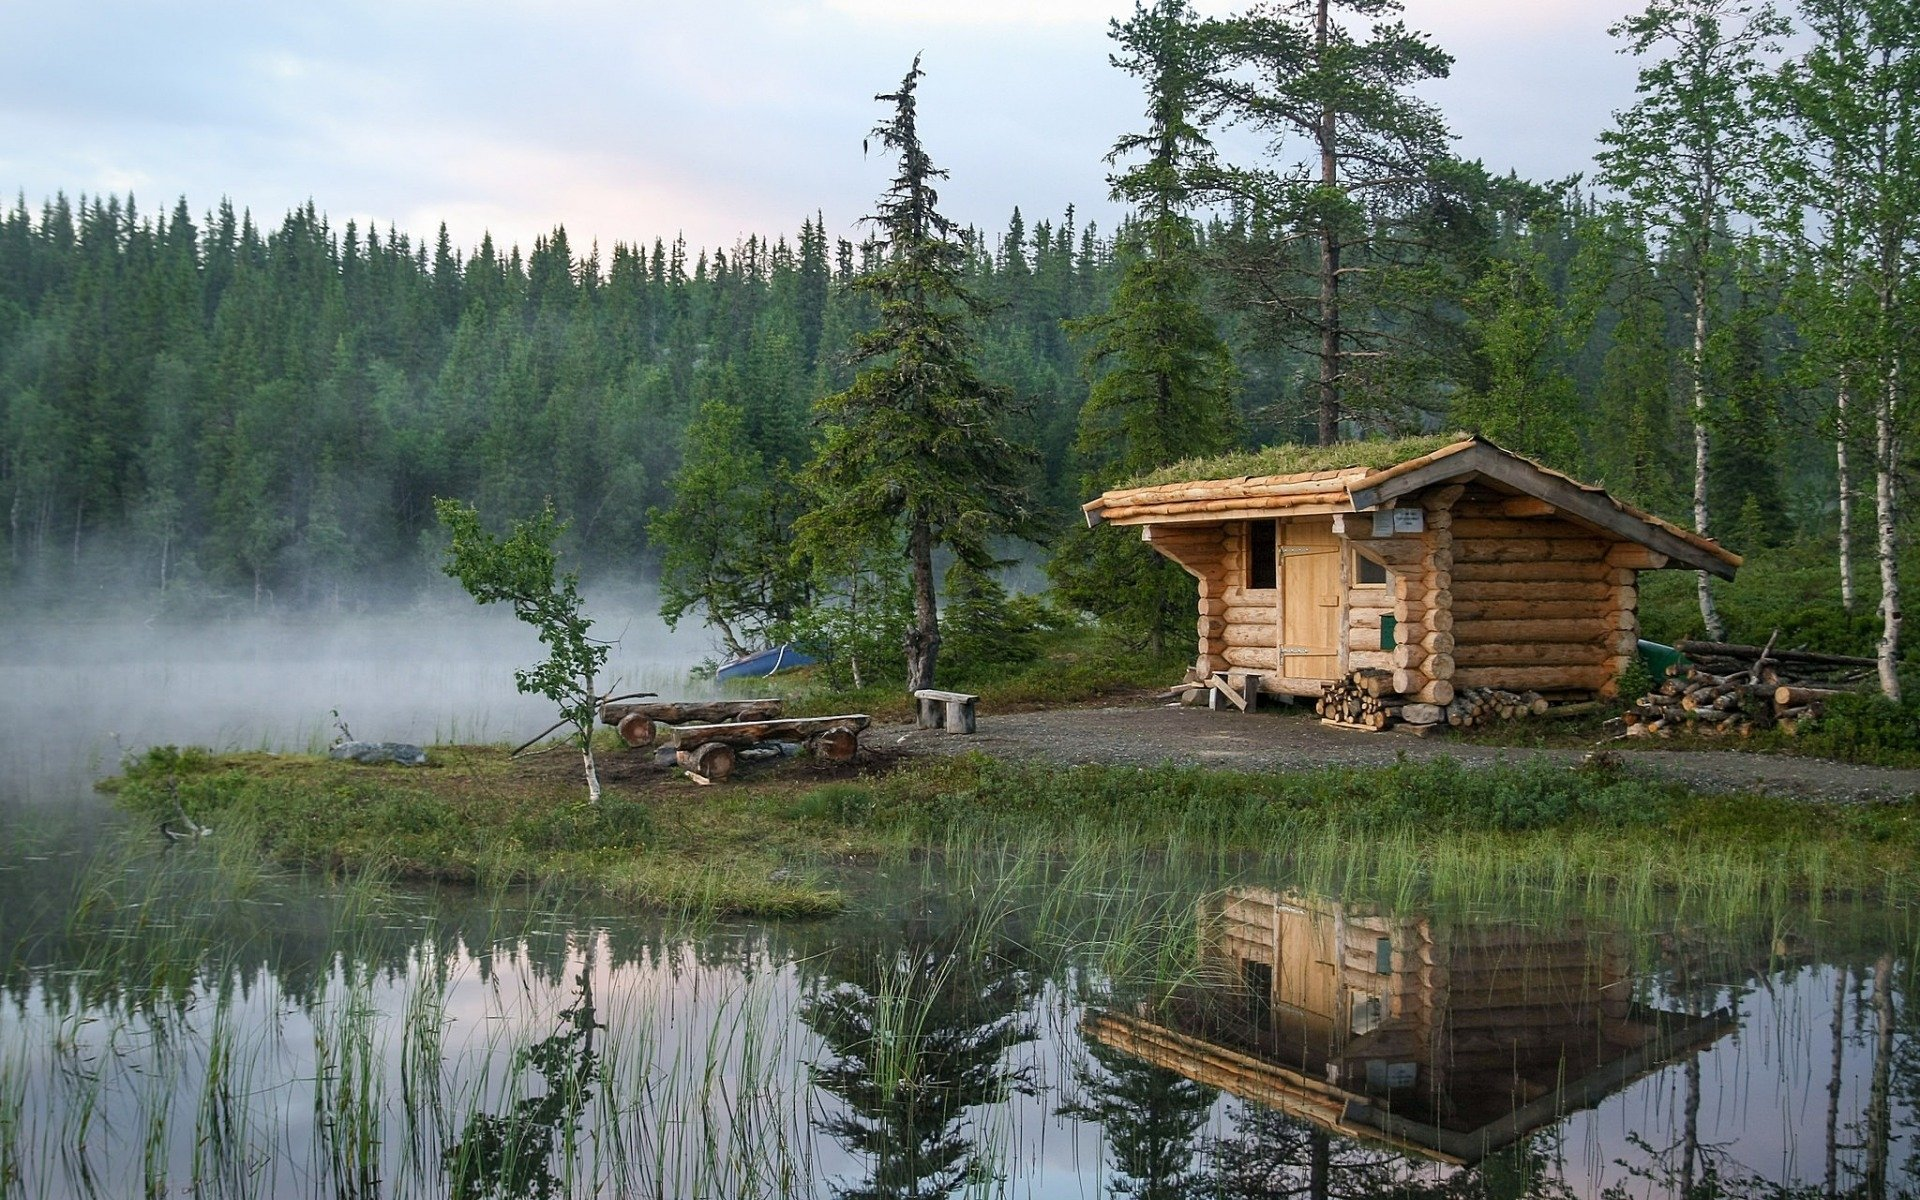 Man Made - Cabin  Reflection Lake Tree Wallpaper